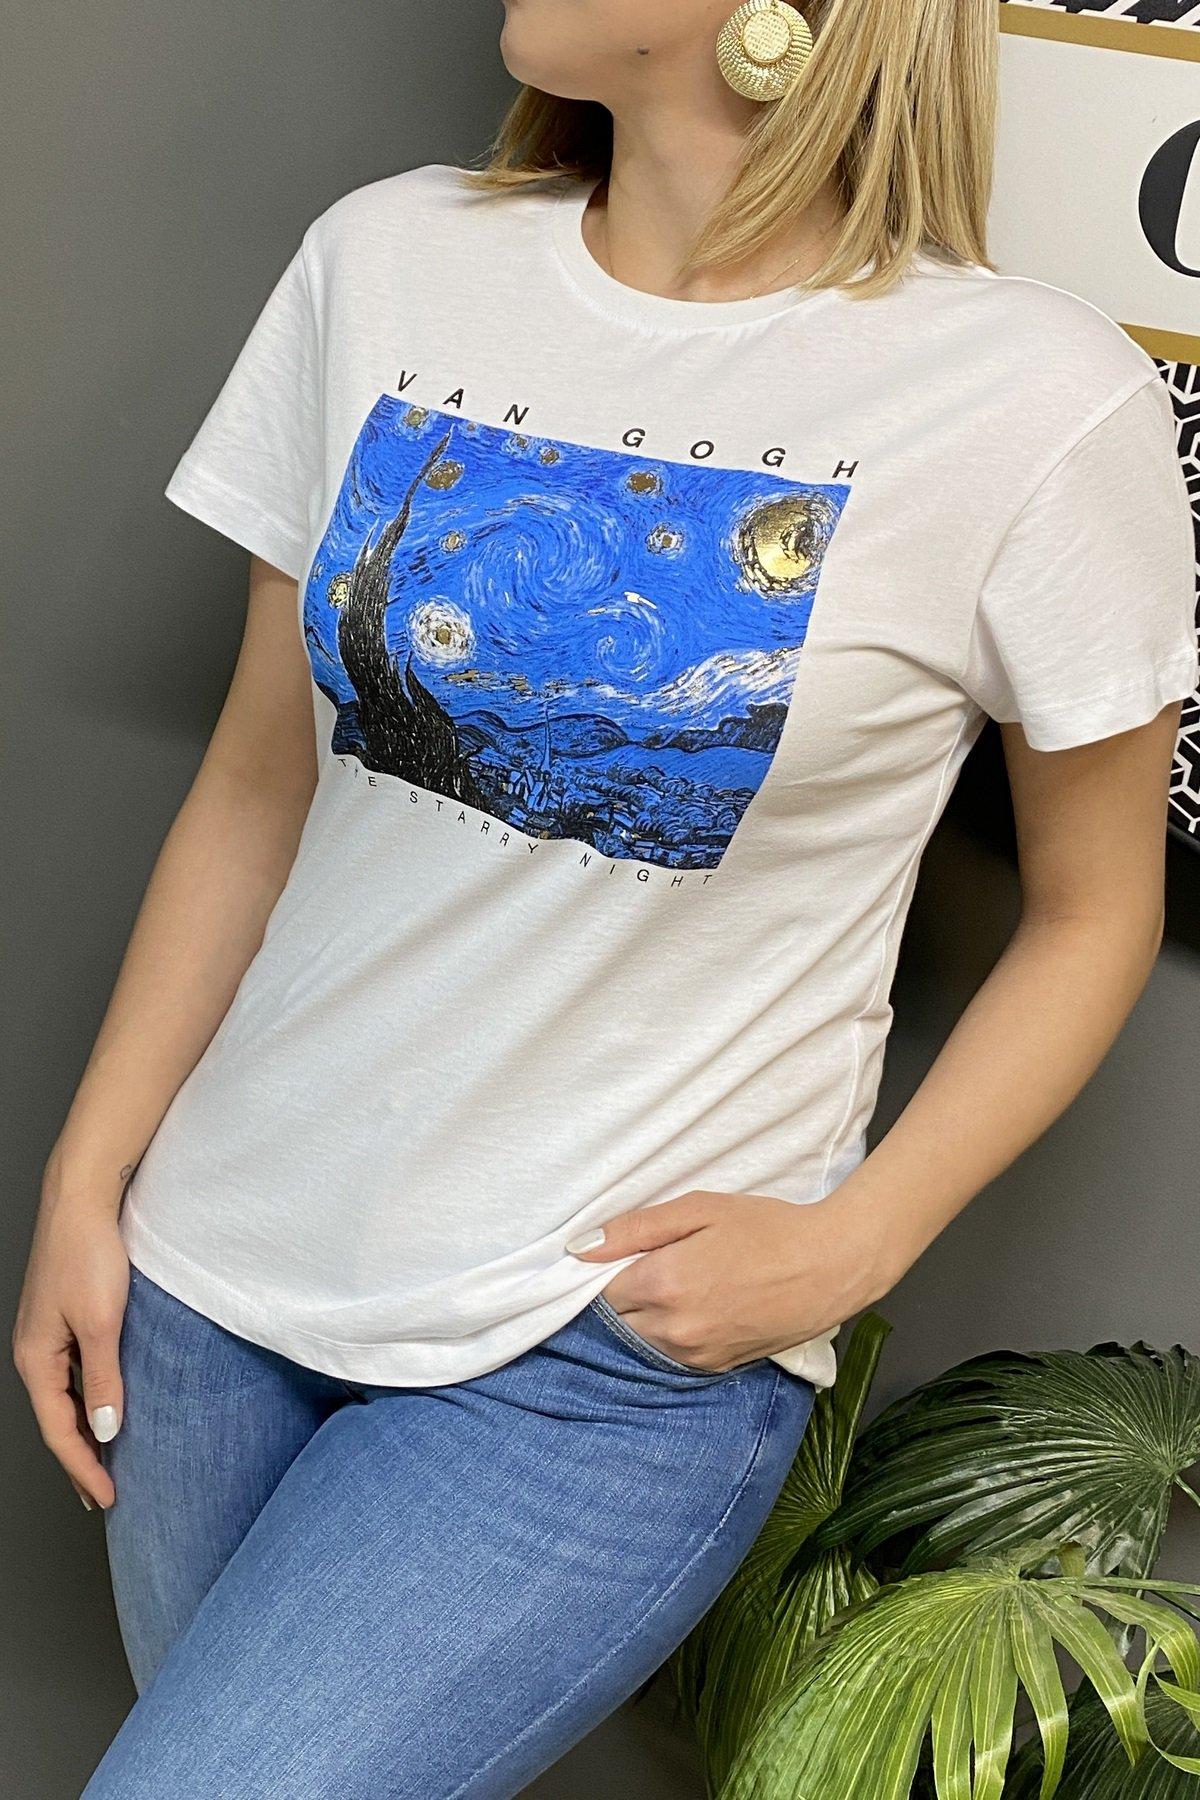 https://resim.chicbag.com.tr/p000614/byz/van-gogh-yildizli-gece-baskili-t-shirt-blggr-01b03df7188a.